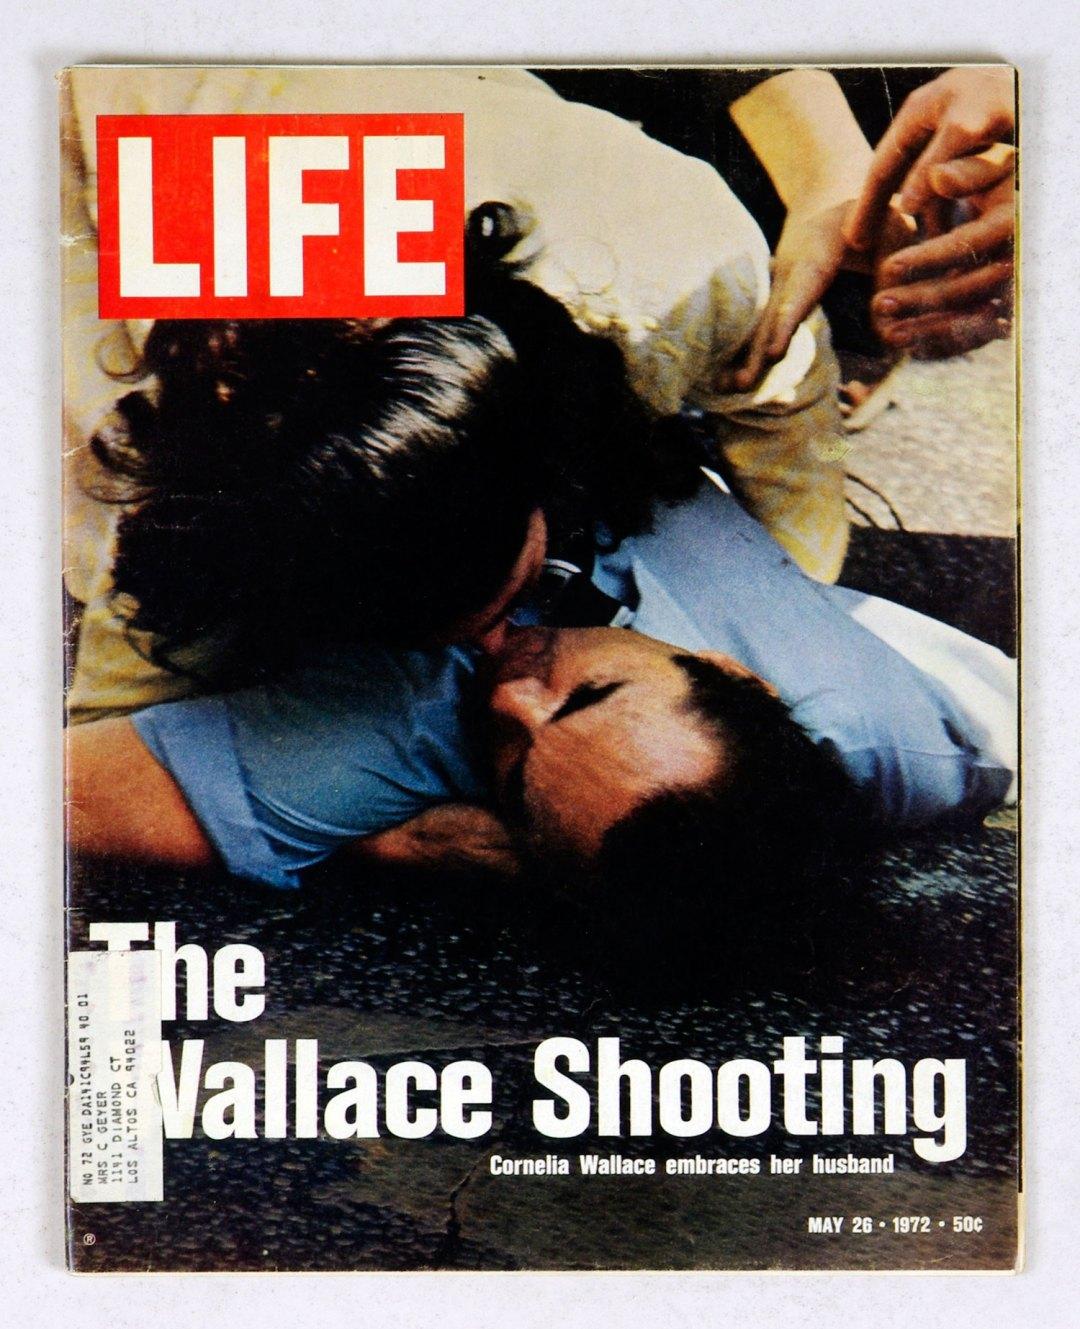 LIFE Magazine 1972 May 26 The Wallace Shooting